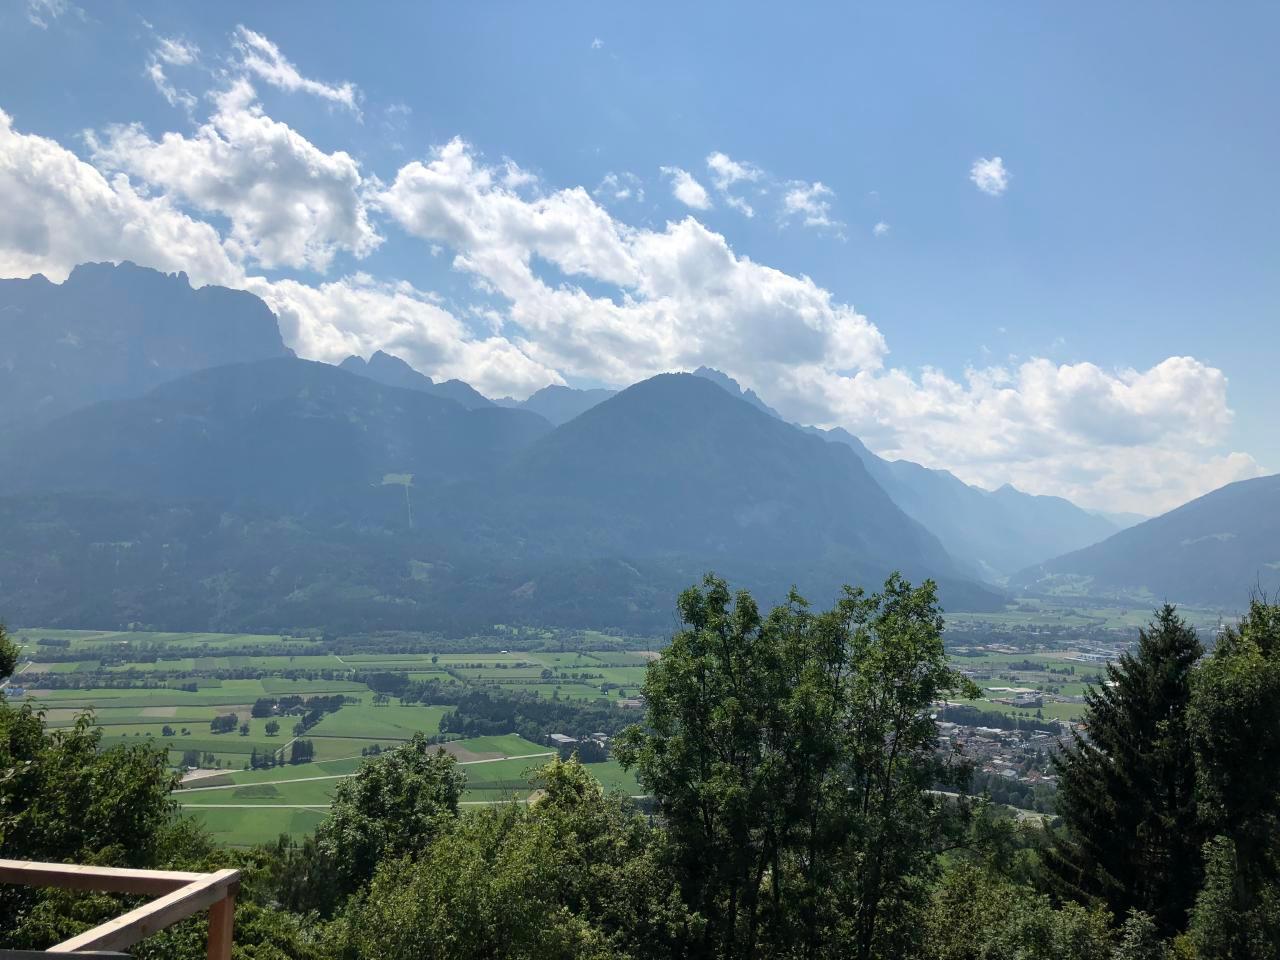 Maison de vacances Landhaus Osttirol (2299545), Dölsach, Osttirol, Tyrol, Autriche, image 47